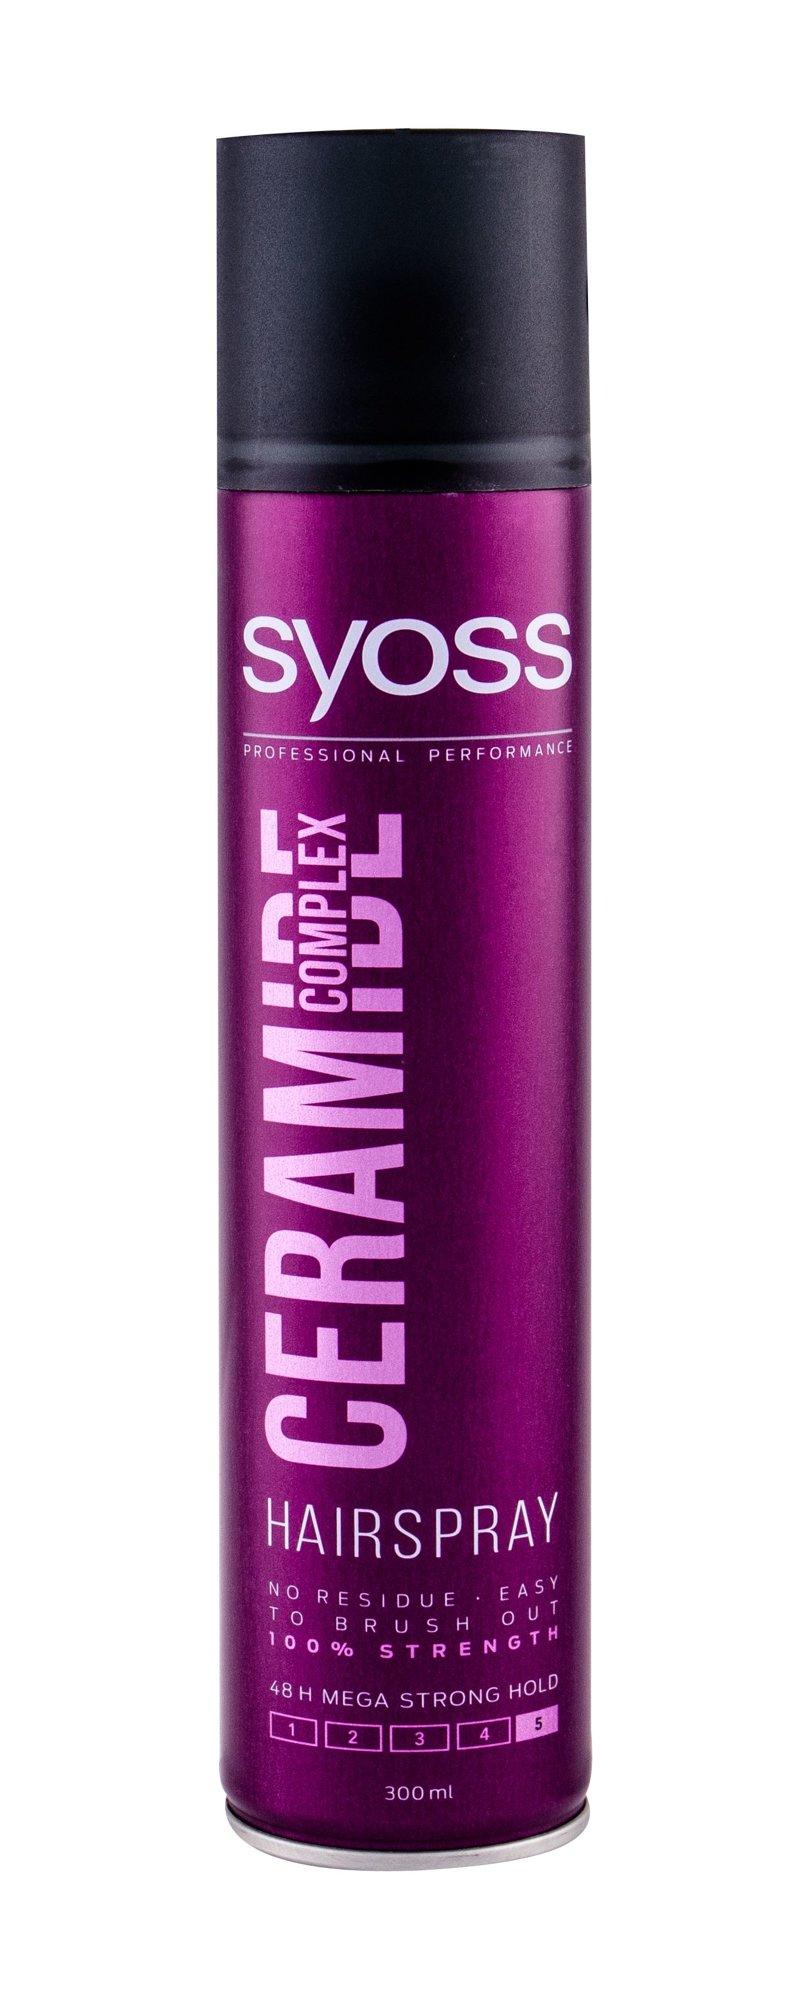 Syoss Professional Performance Ceramide Complex Hair Spray 300ml